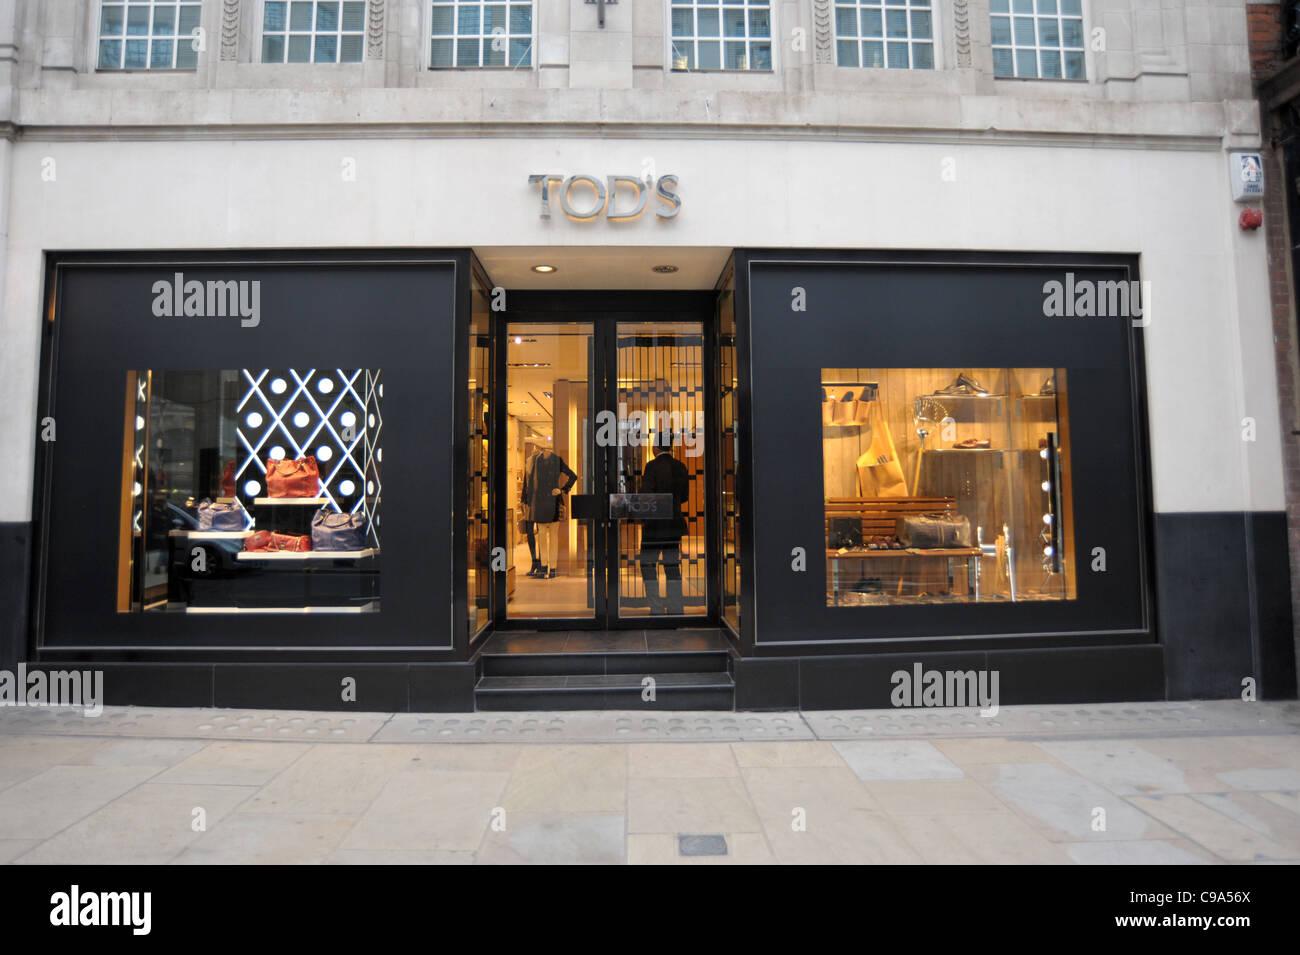 9689044b09 Exterior shot of Tods store on Bond Street London England 2011 - Image  Copyright Ben Pruchnie